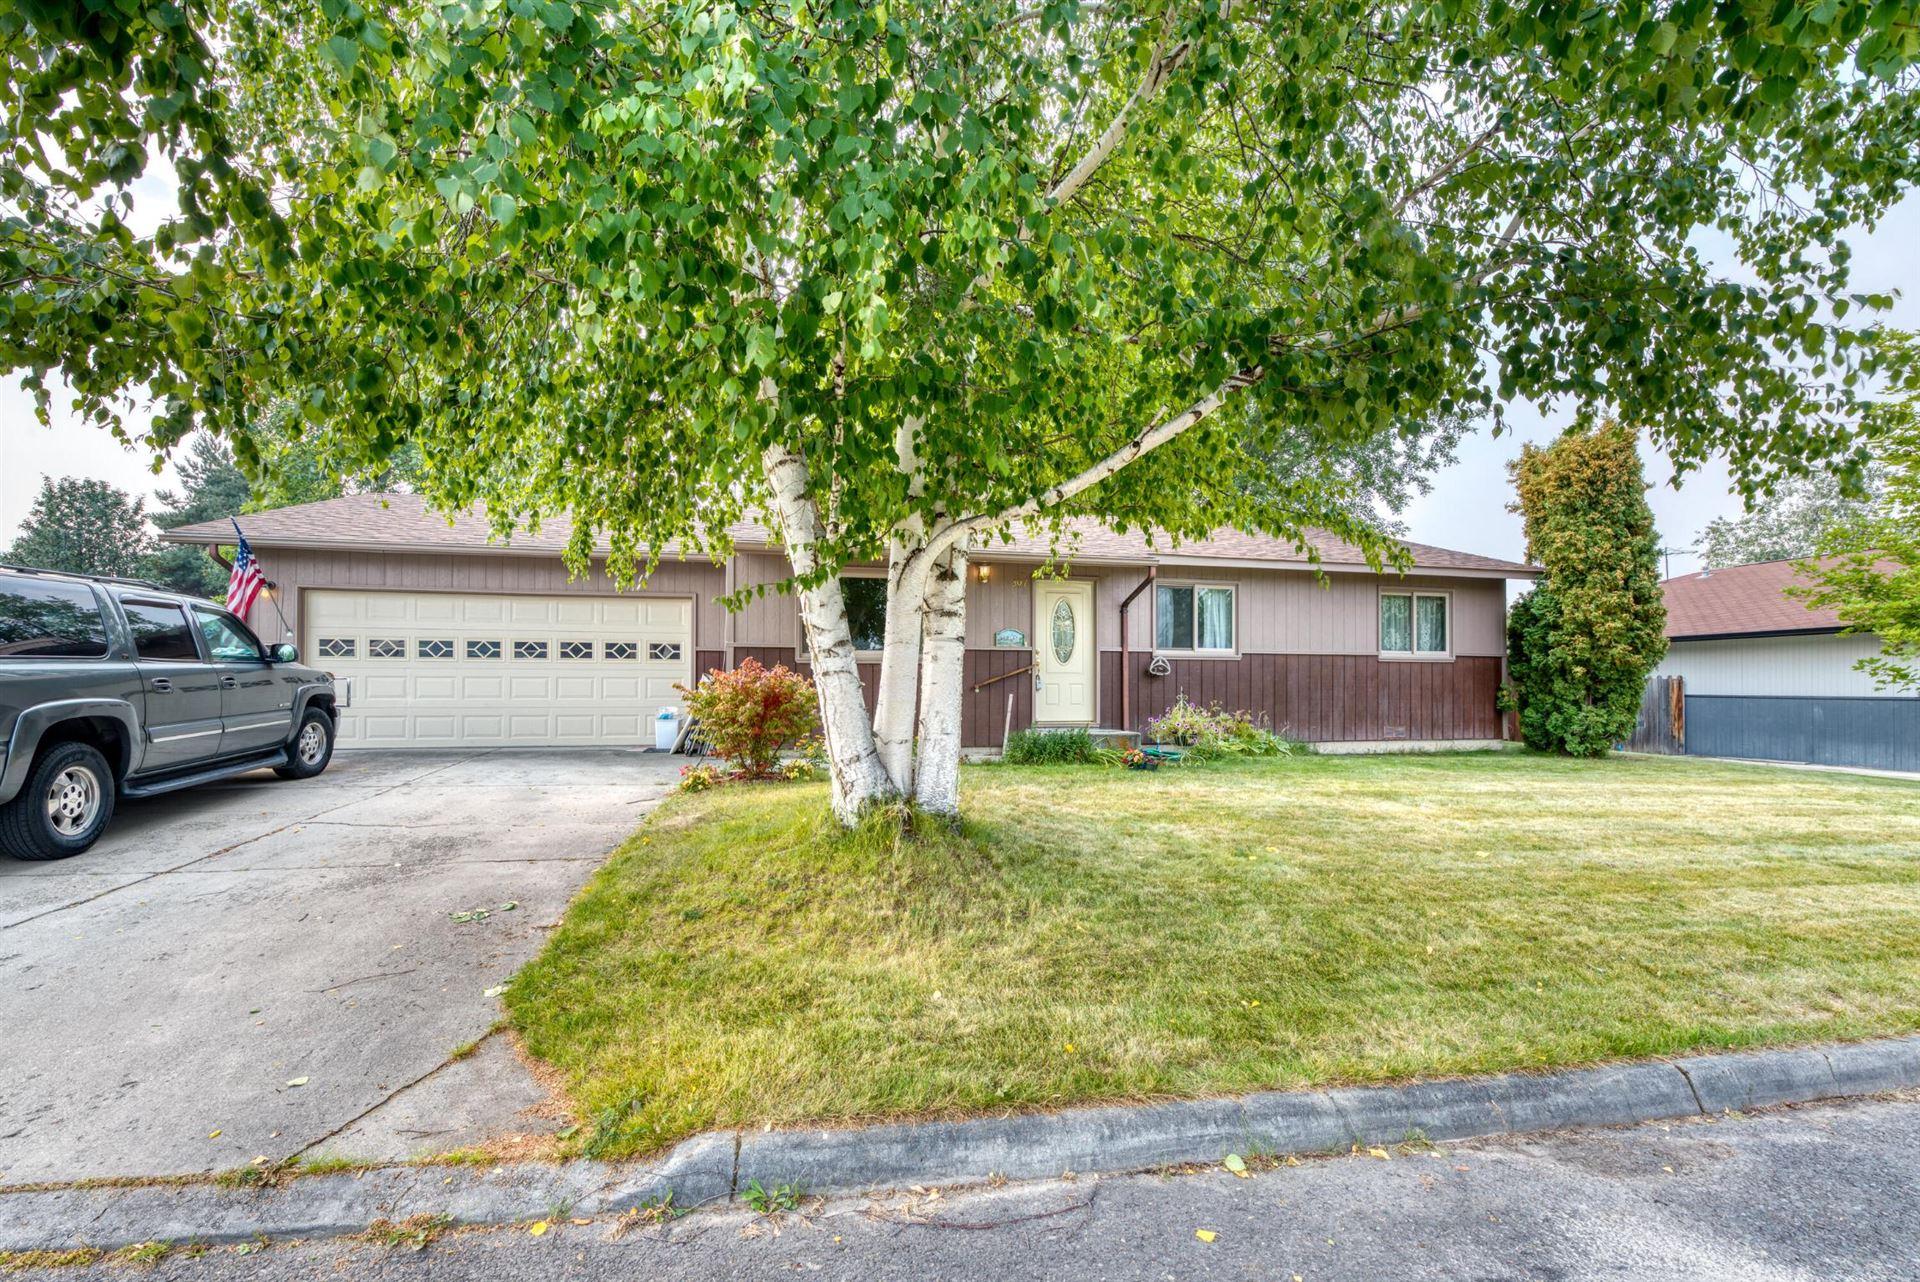 Photo of 307 8th Street, Stevensville, MT 59870 (MLS # 22114572)